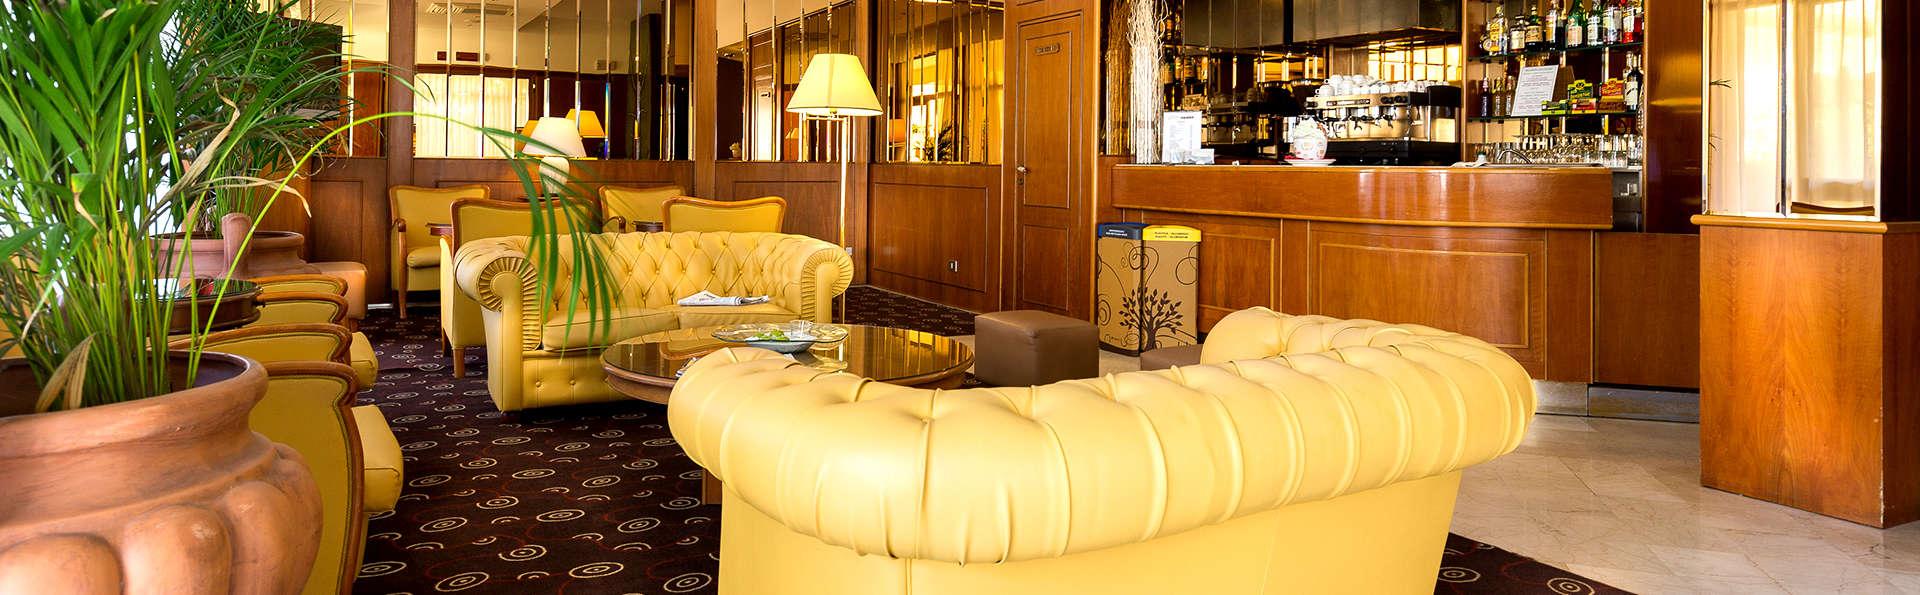 Hotel Perù Ambienthotels - EDIT_NEW_HALL.jpg